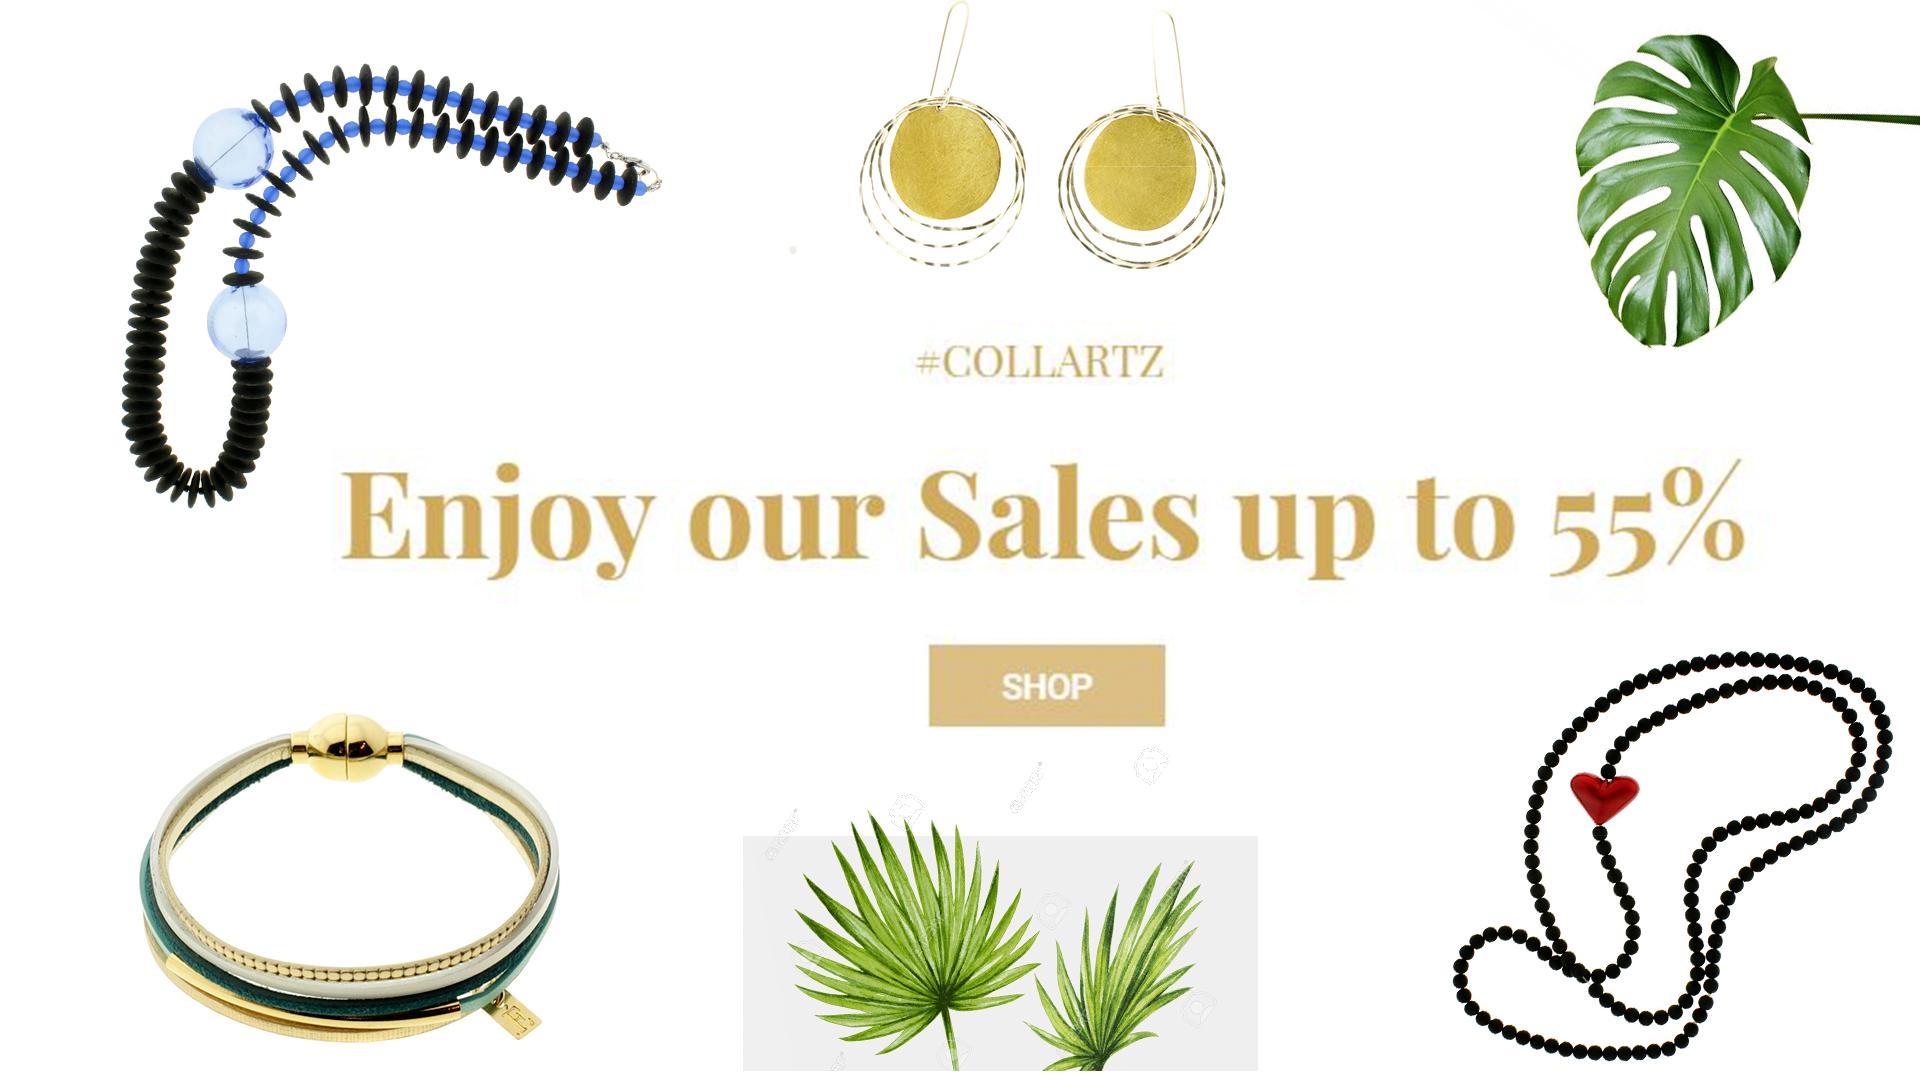 Collartz-Sales-Sustainable Design Jewels